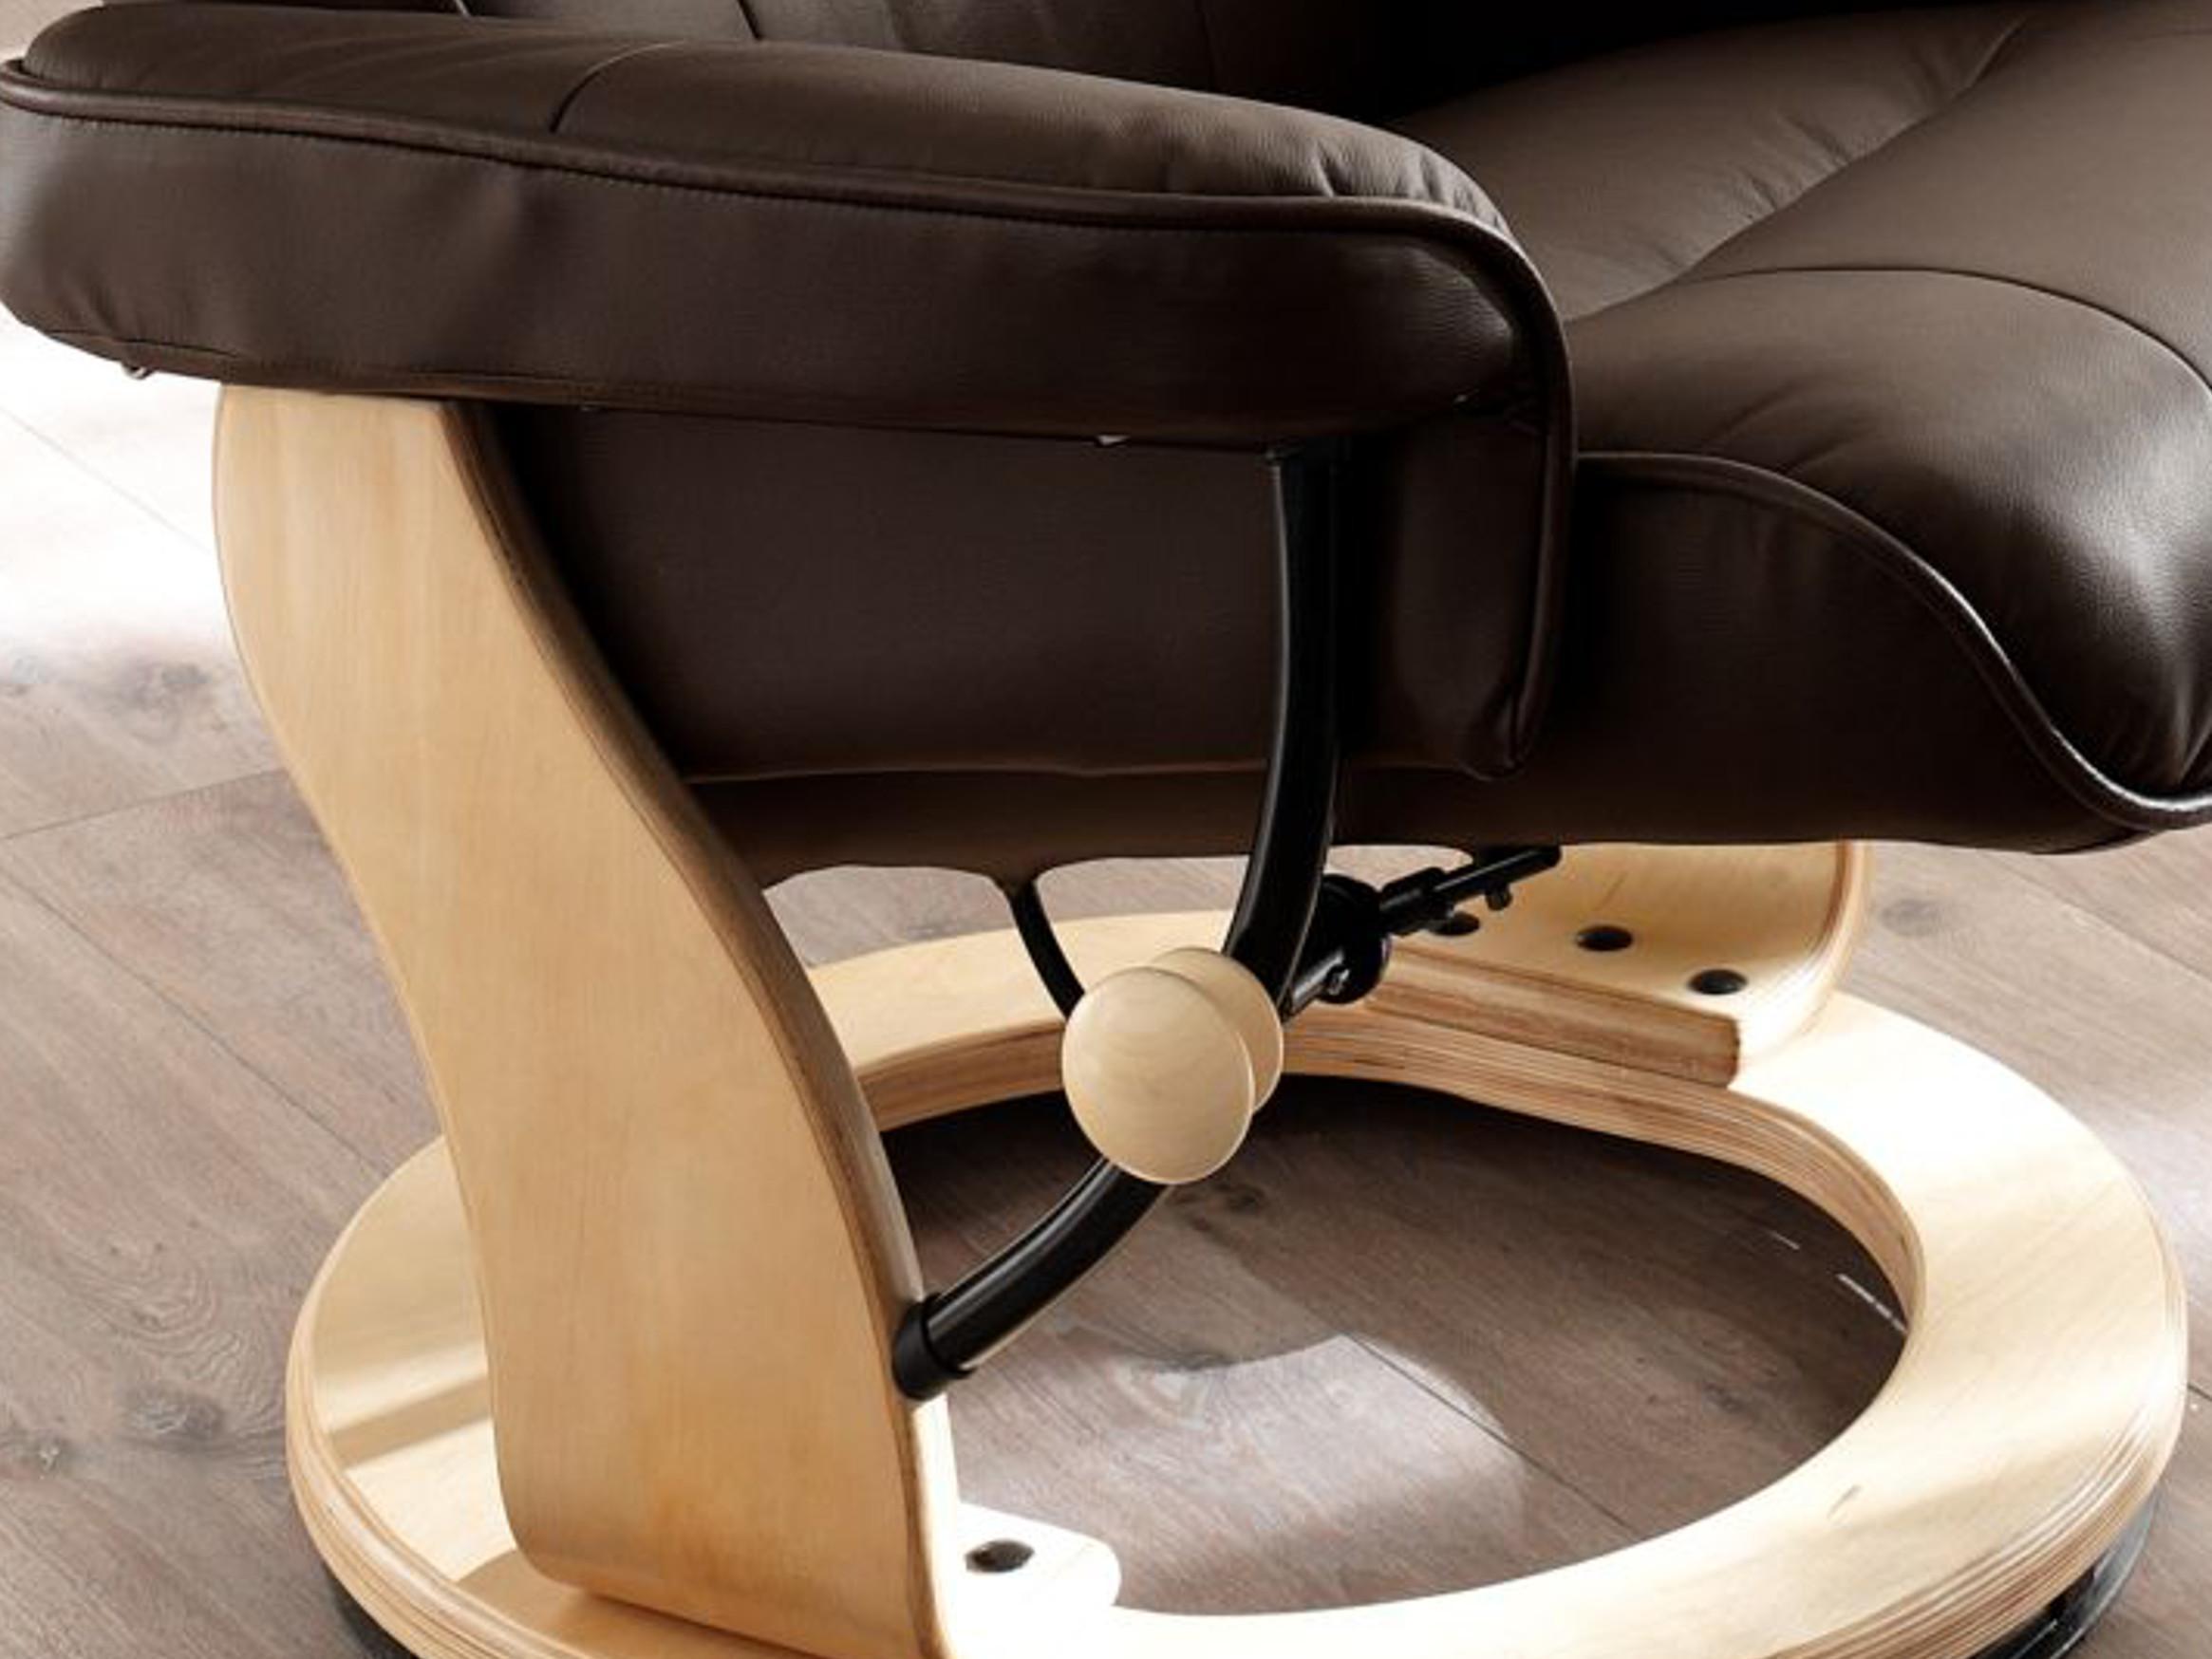 robas lund sessel relaxsessel montreal mit hocker leder braun 64022bn5 k che. Black Bedroom Furniture Sets. Home Design Ideas